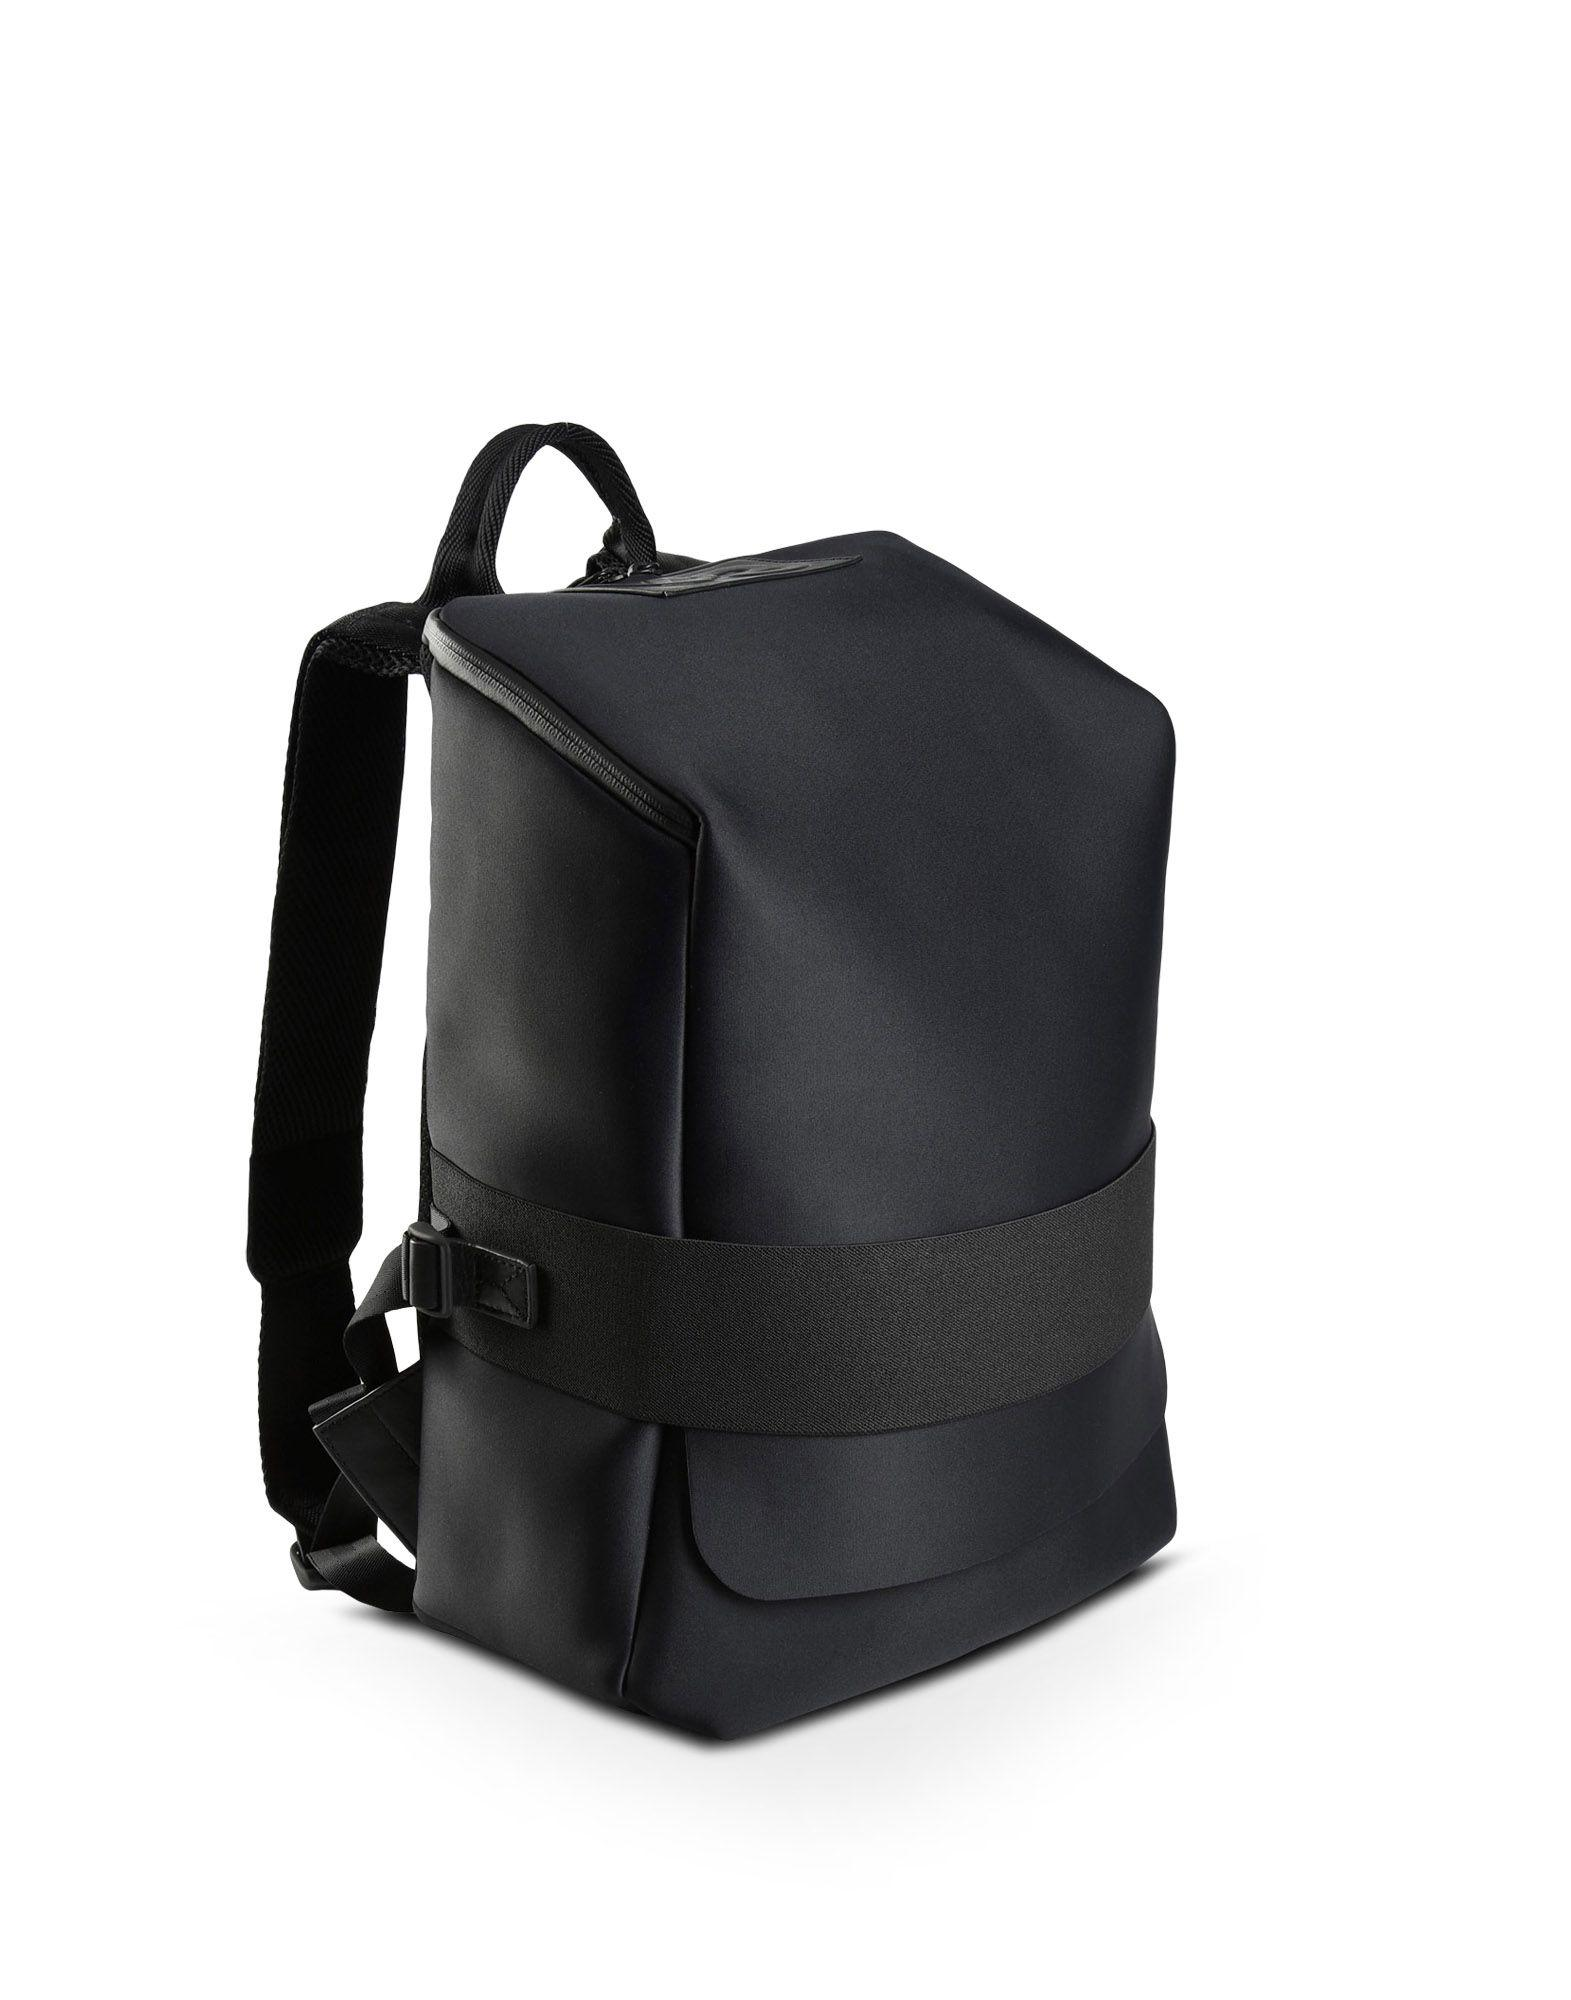 aaa479759c1b Lyst - Y-3 Qasa Backpack Small in Black for Men